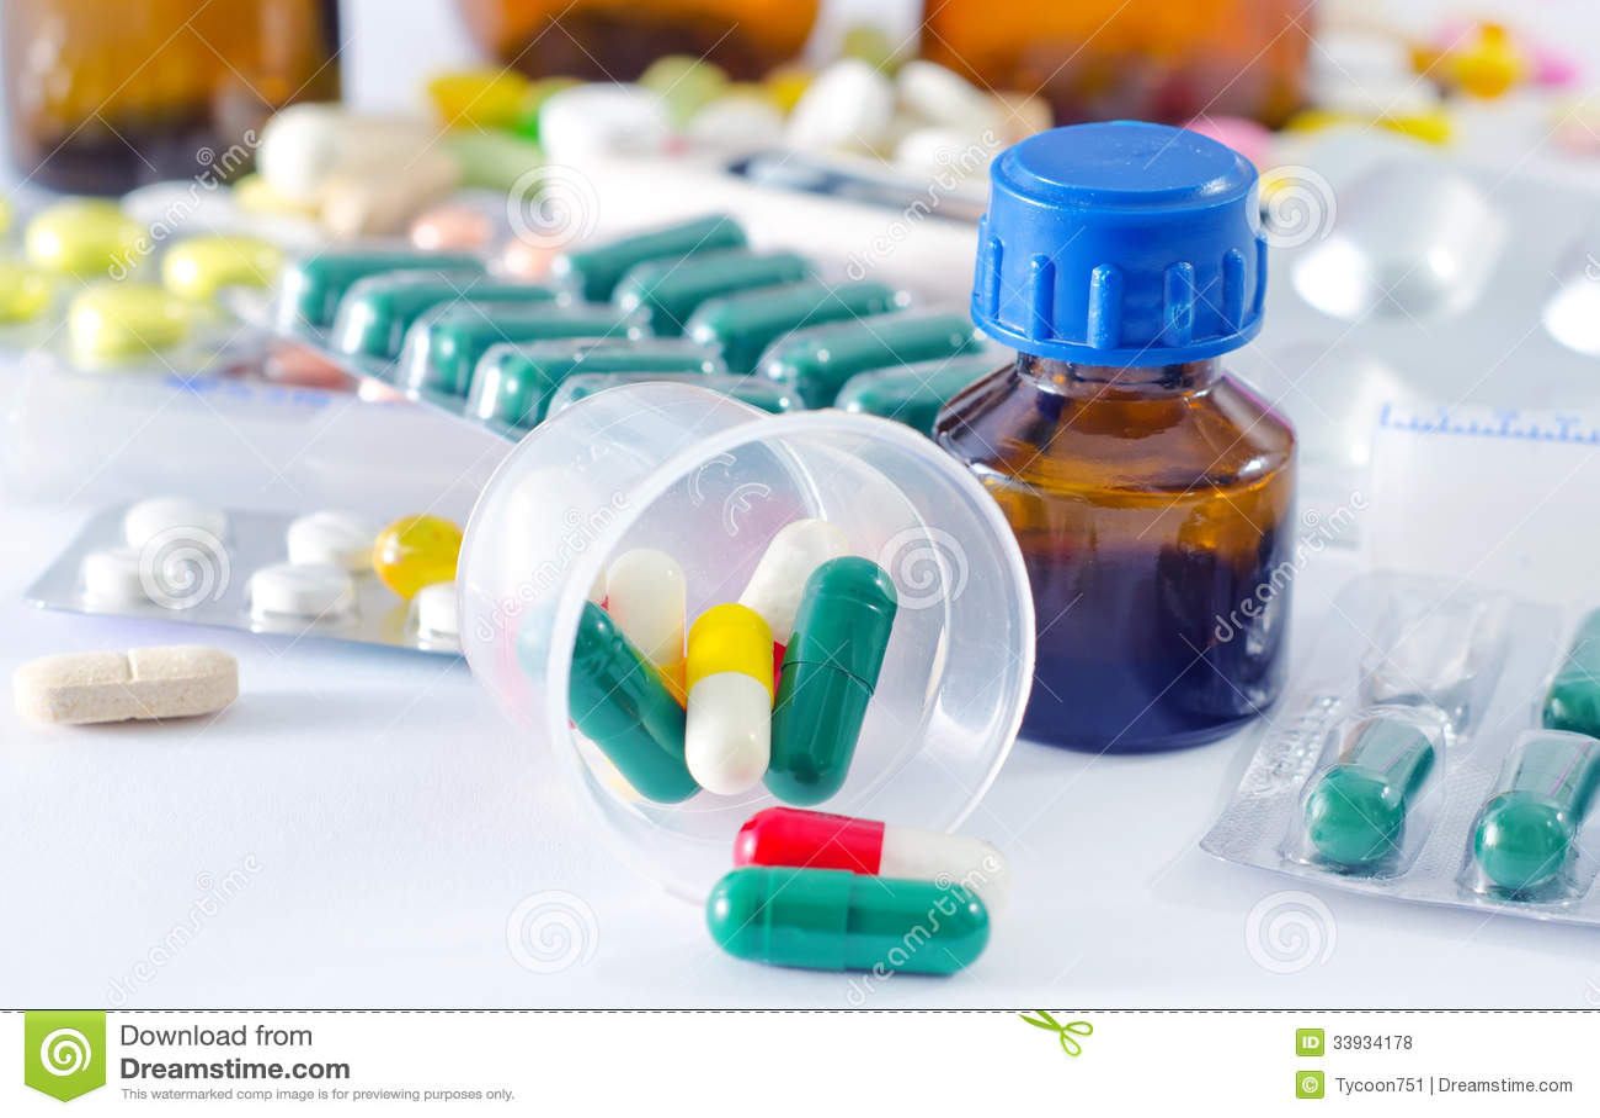 Supplies Medical Supplies